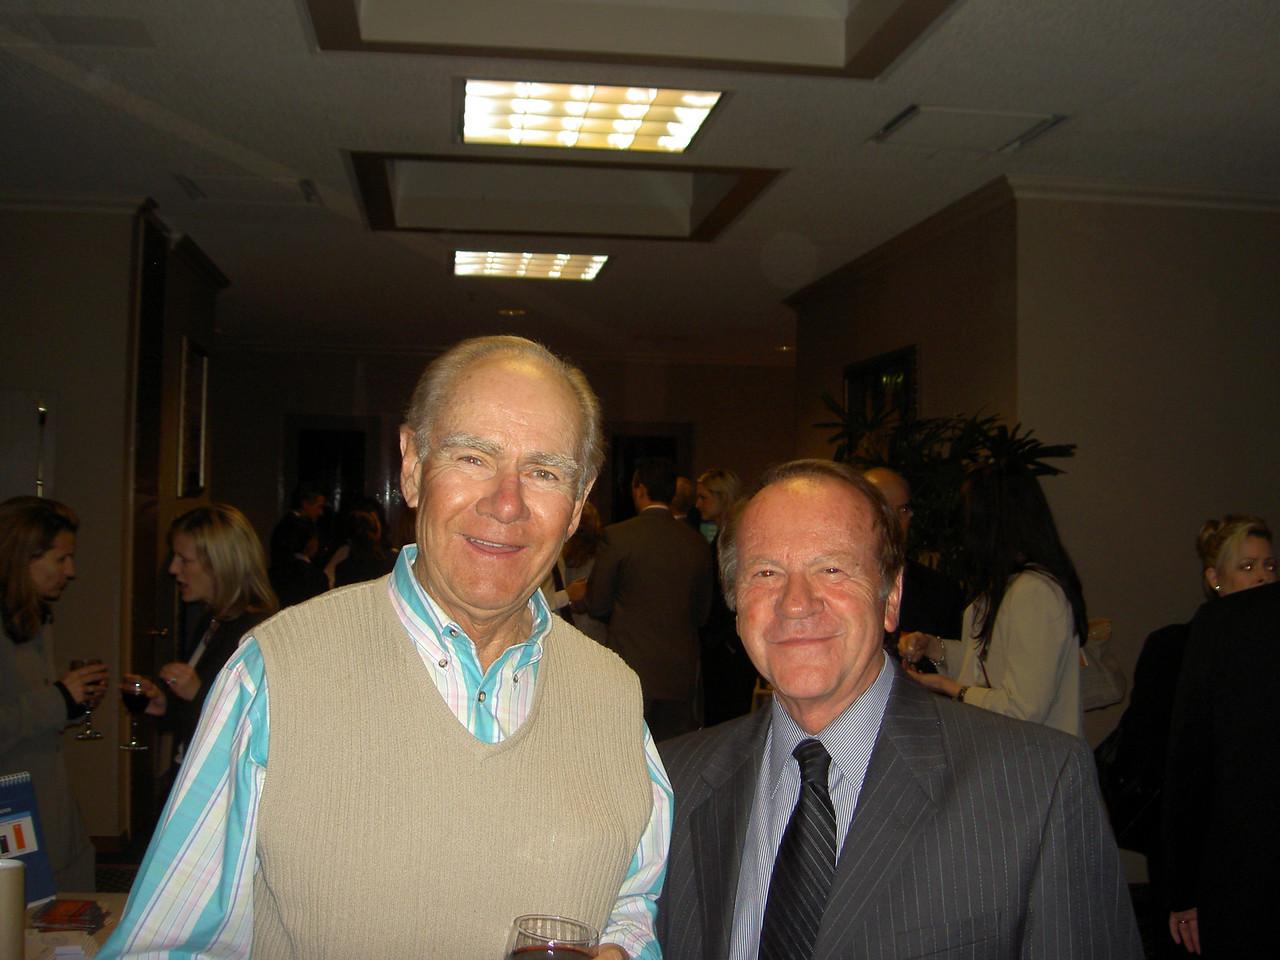 Herman Rundle & Bob Ruper